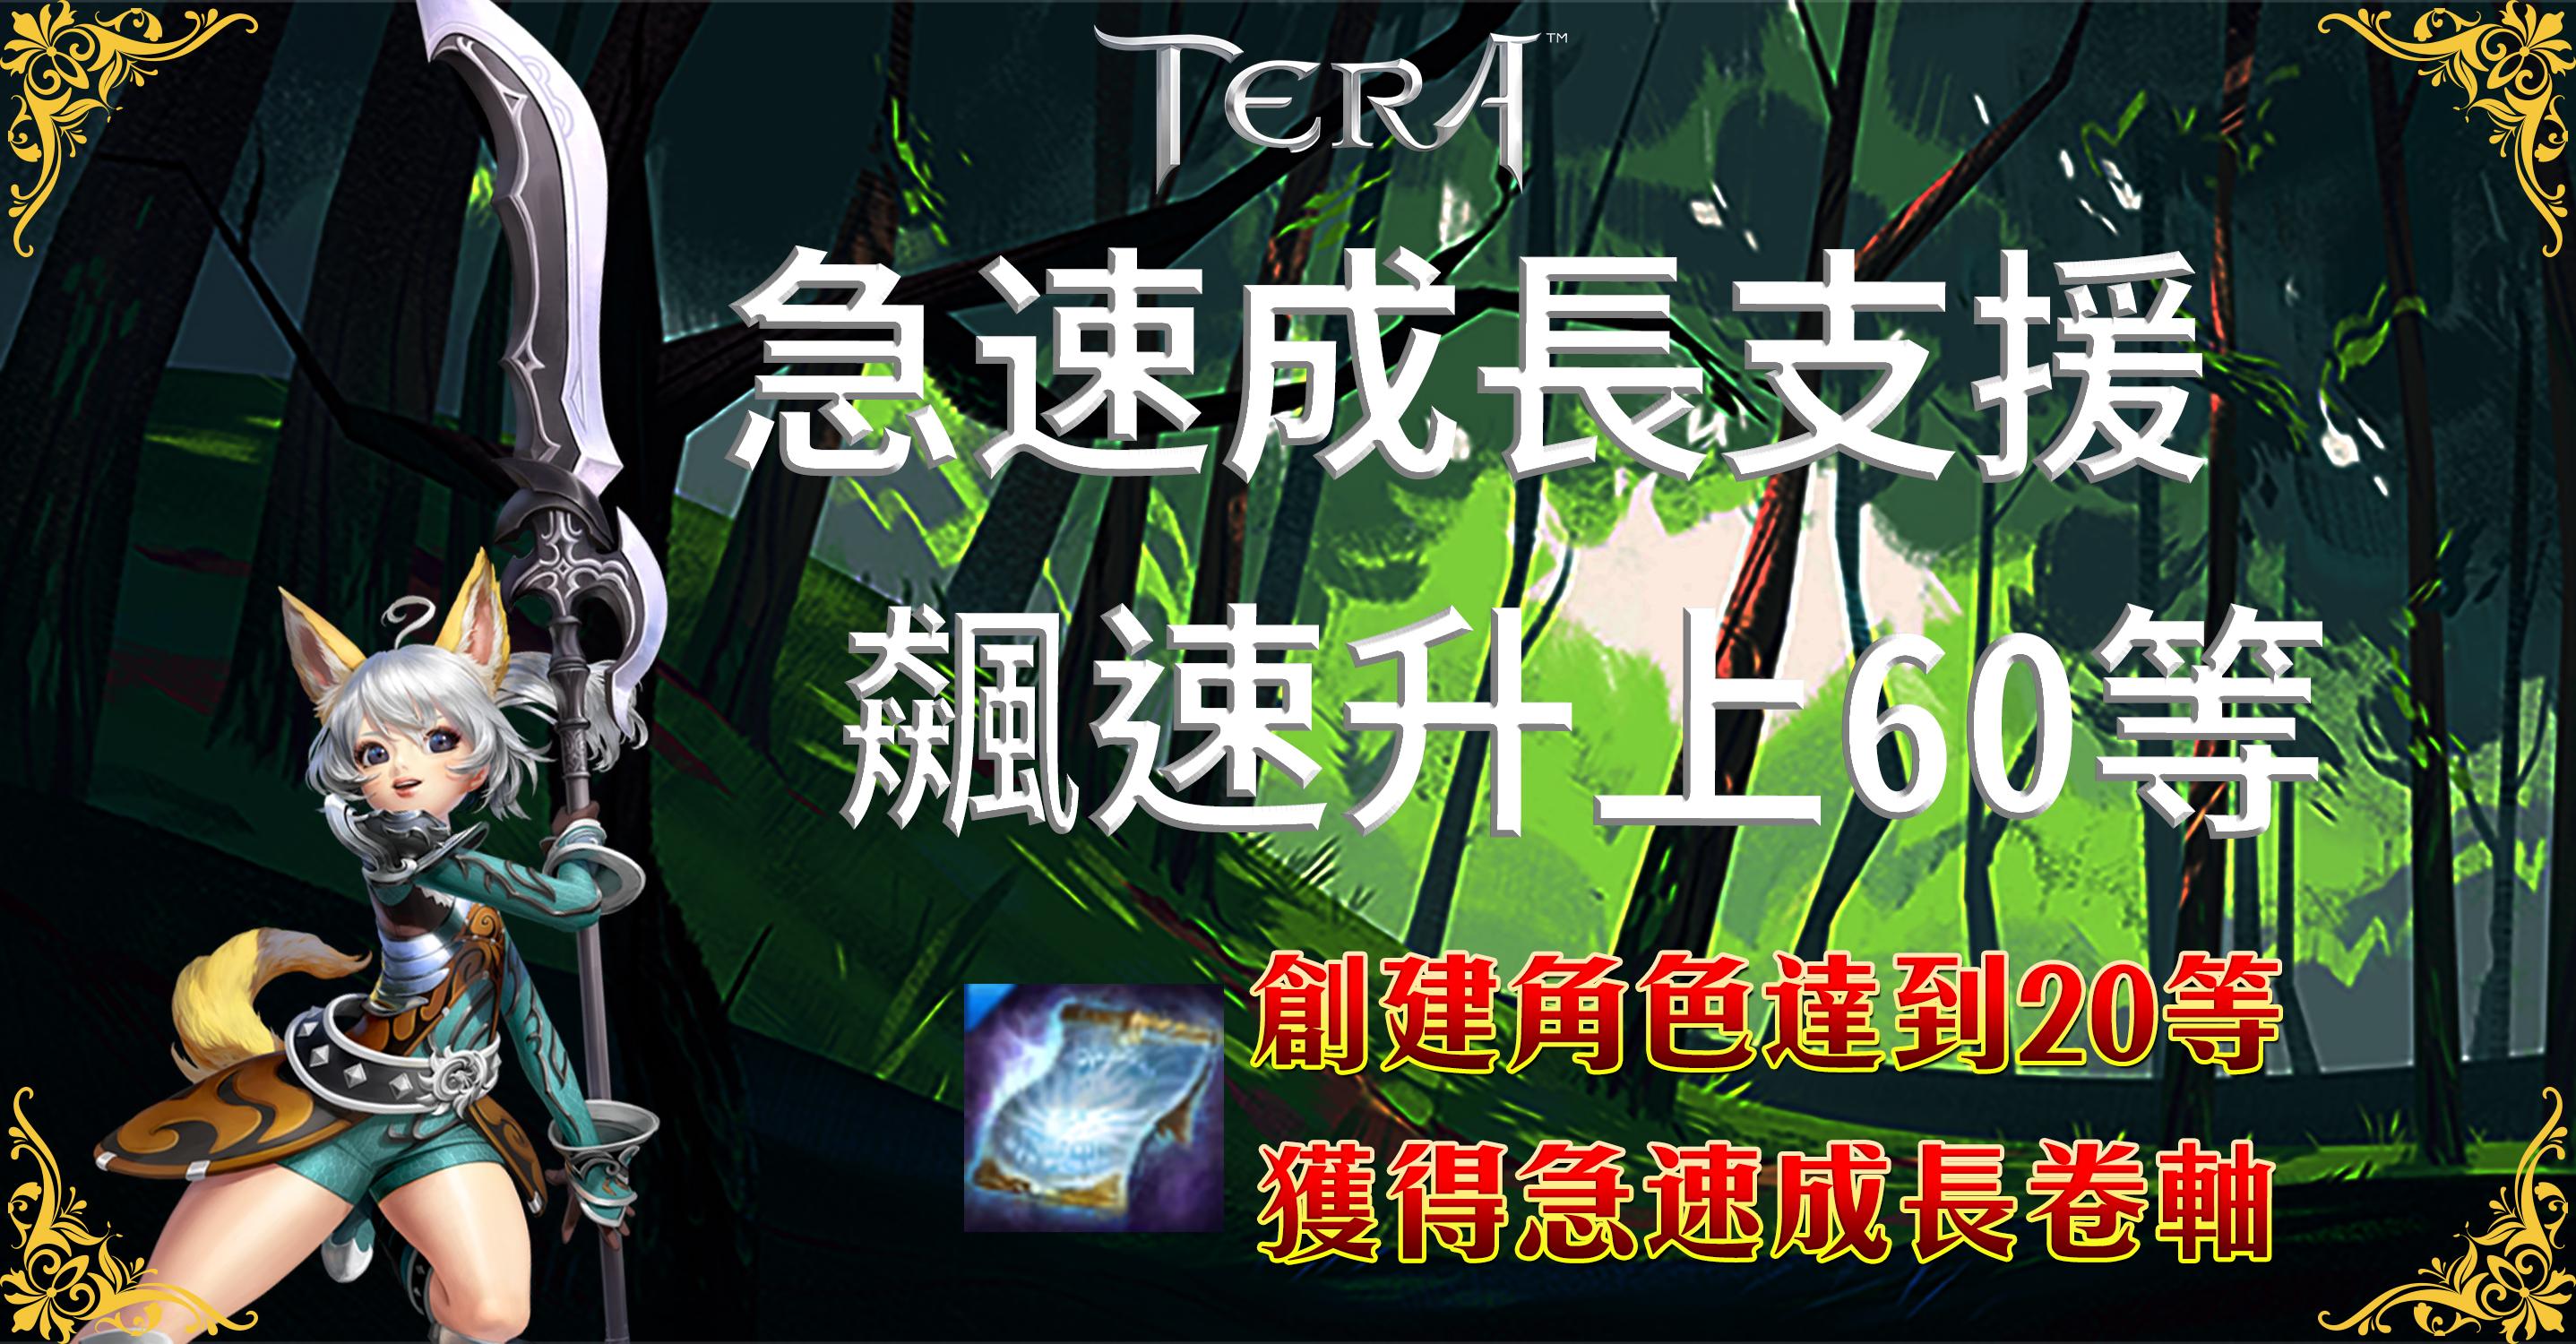 "《TERA Online》限制解禁,,艾琳將可加入月光武士!全新航海副本""金麟號""開放,立即出航尋寶。"